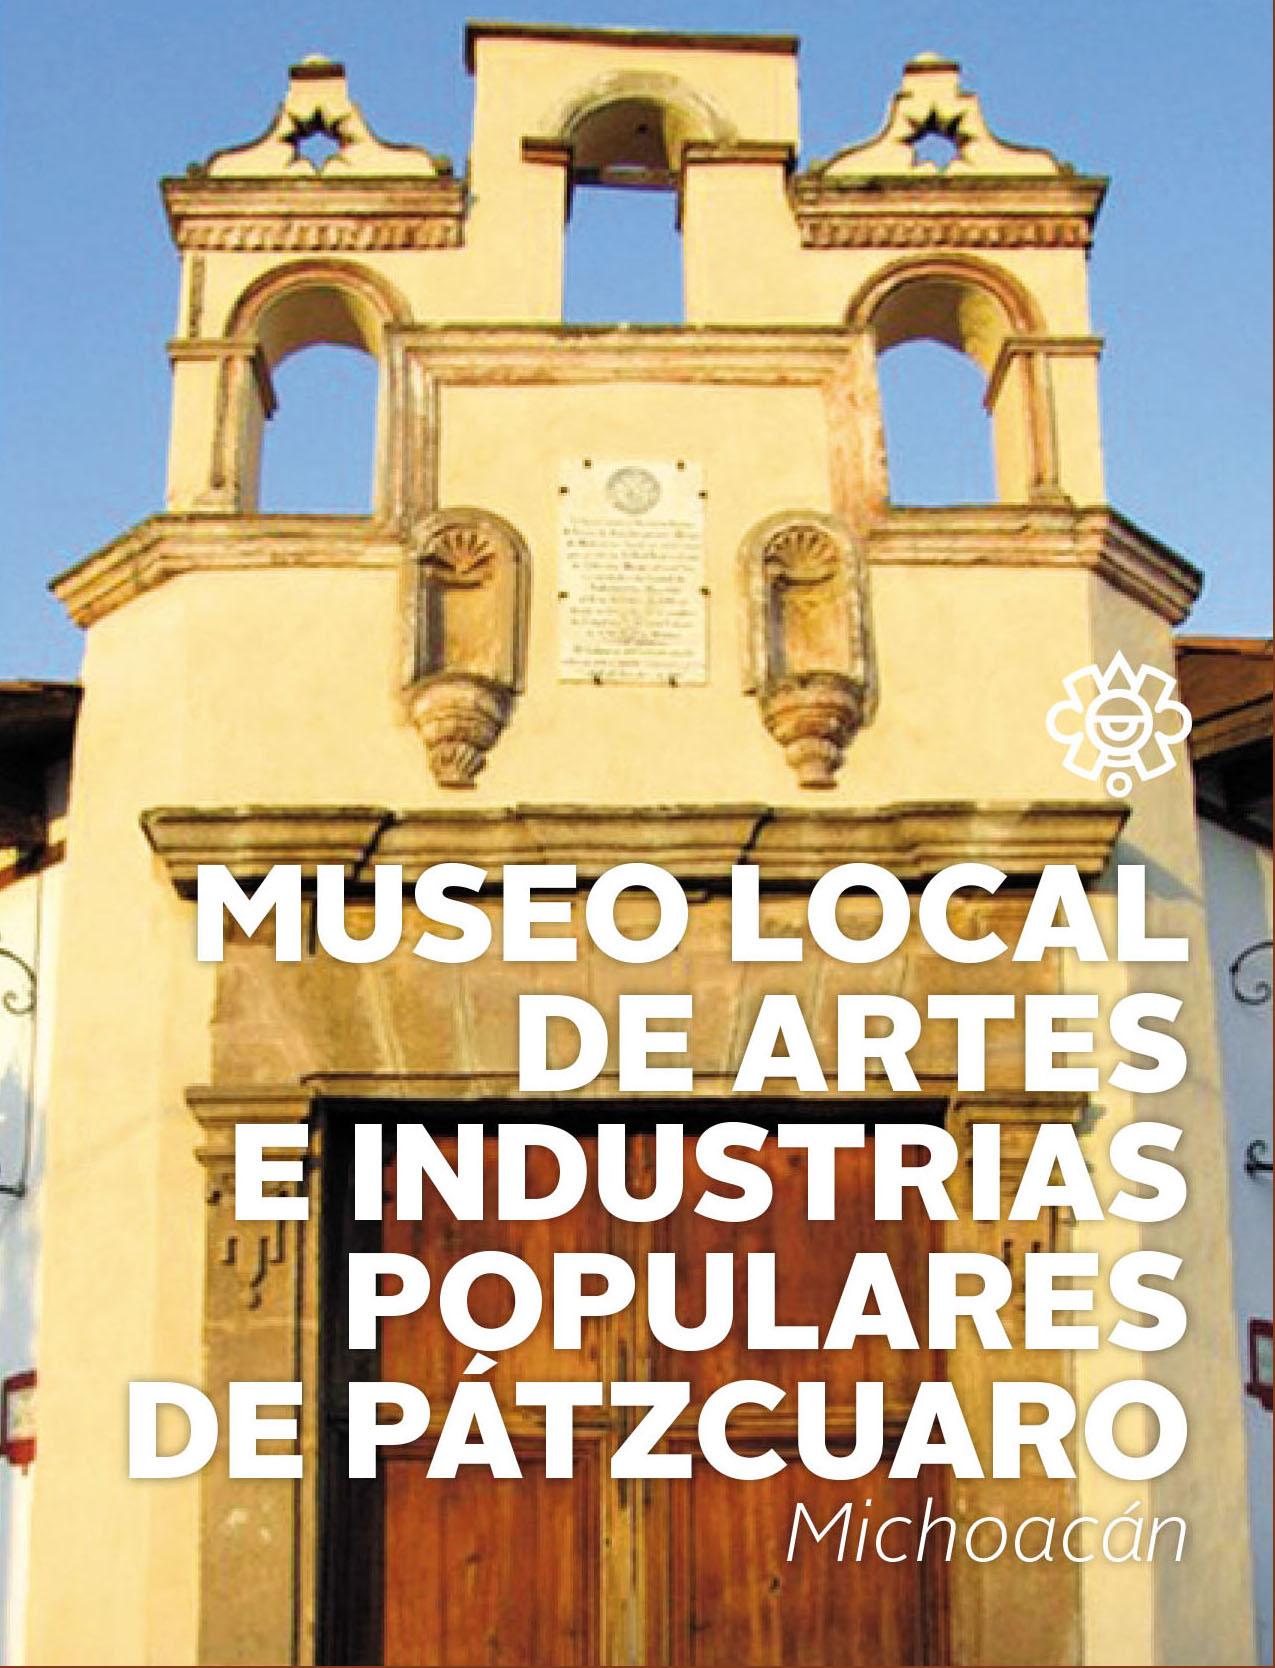 Museo Local de Artes e Industrias Populares de Pátzcuaro